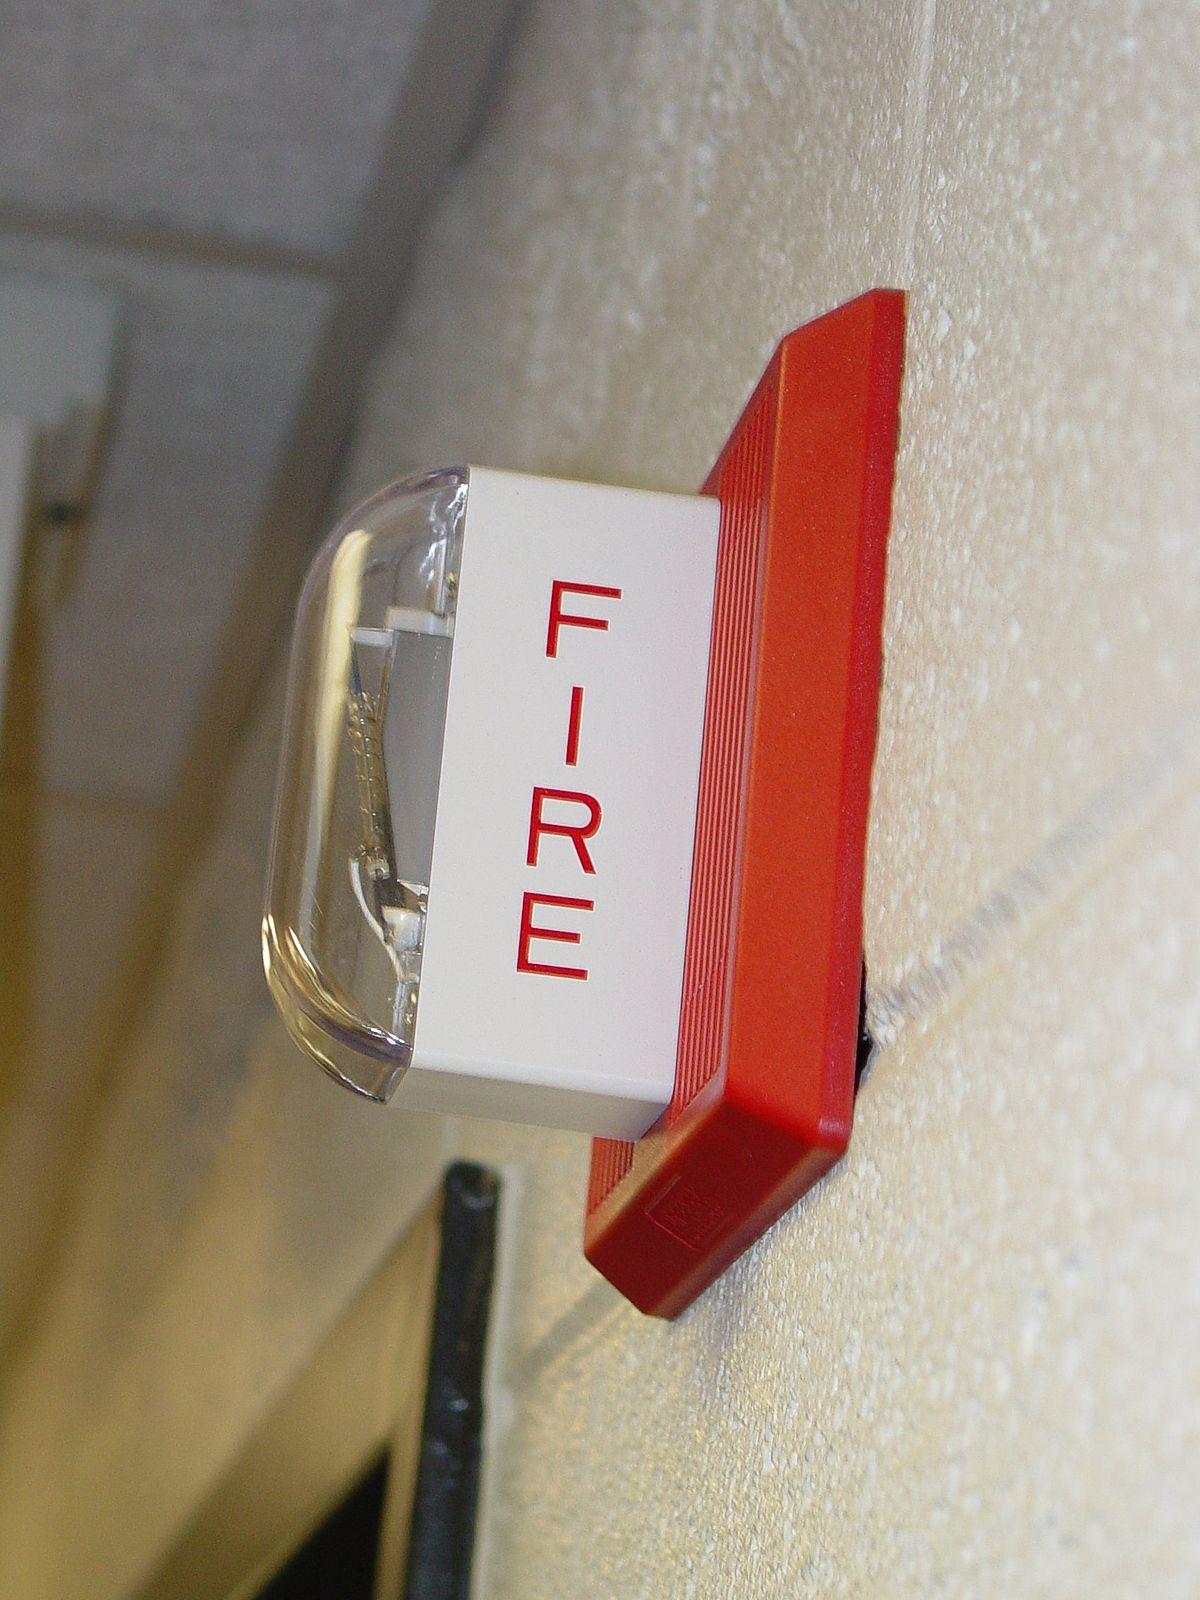 Fire Alarm Wikimedia Commons